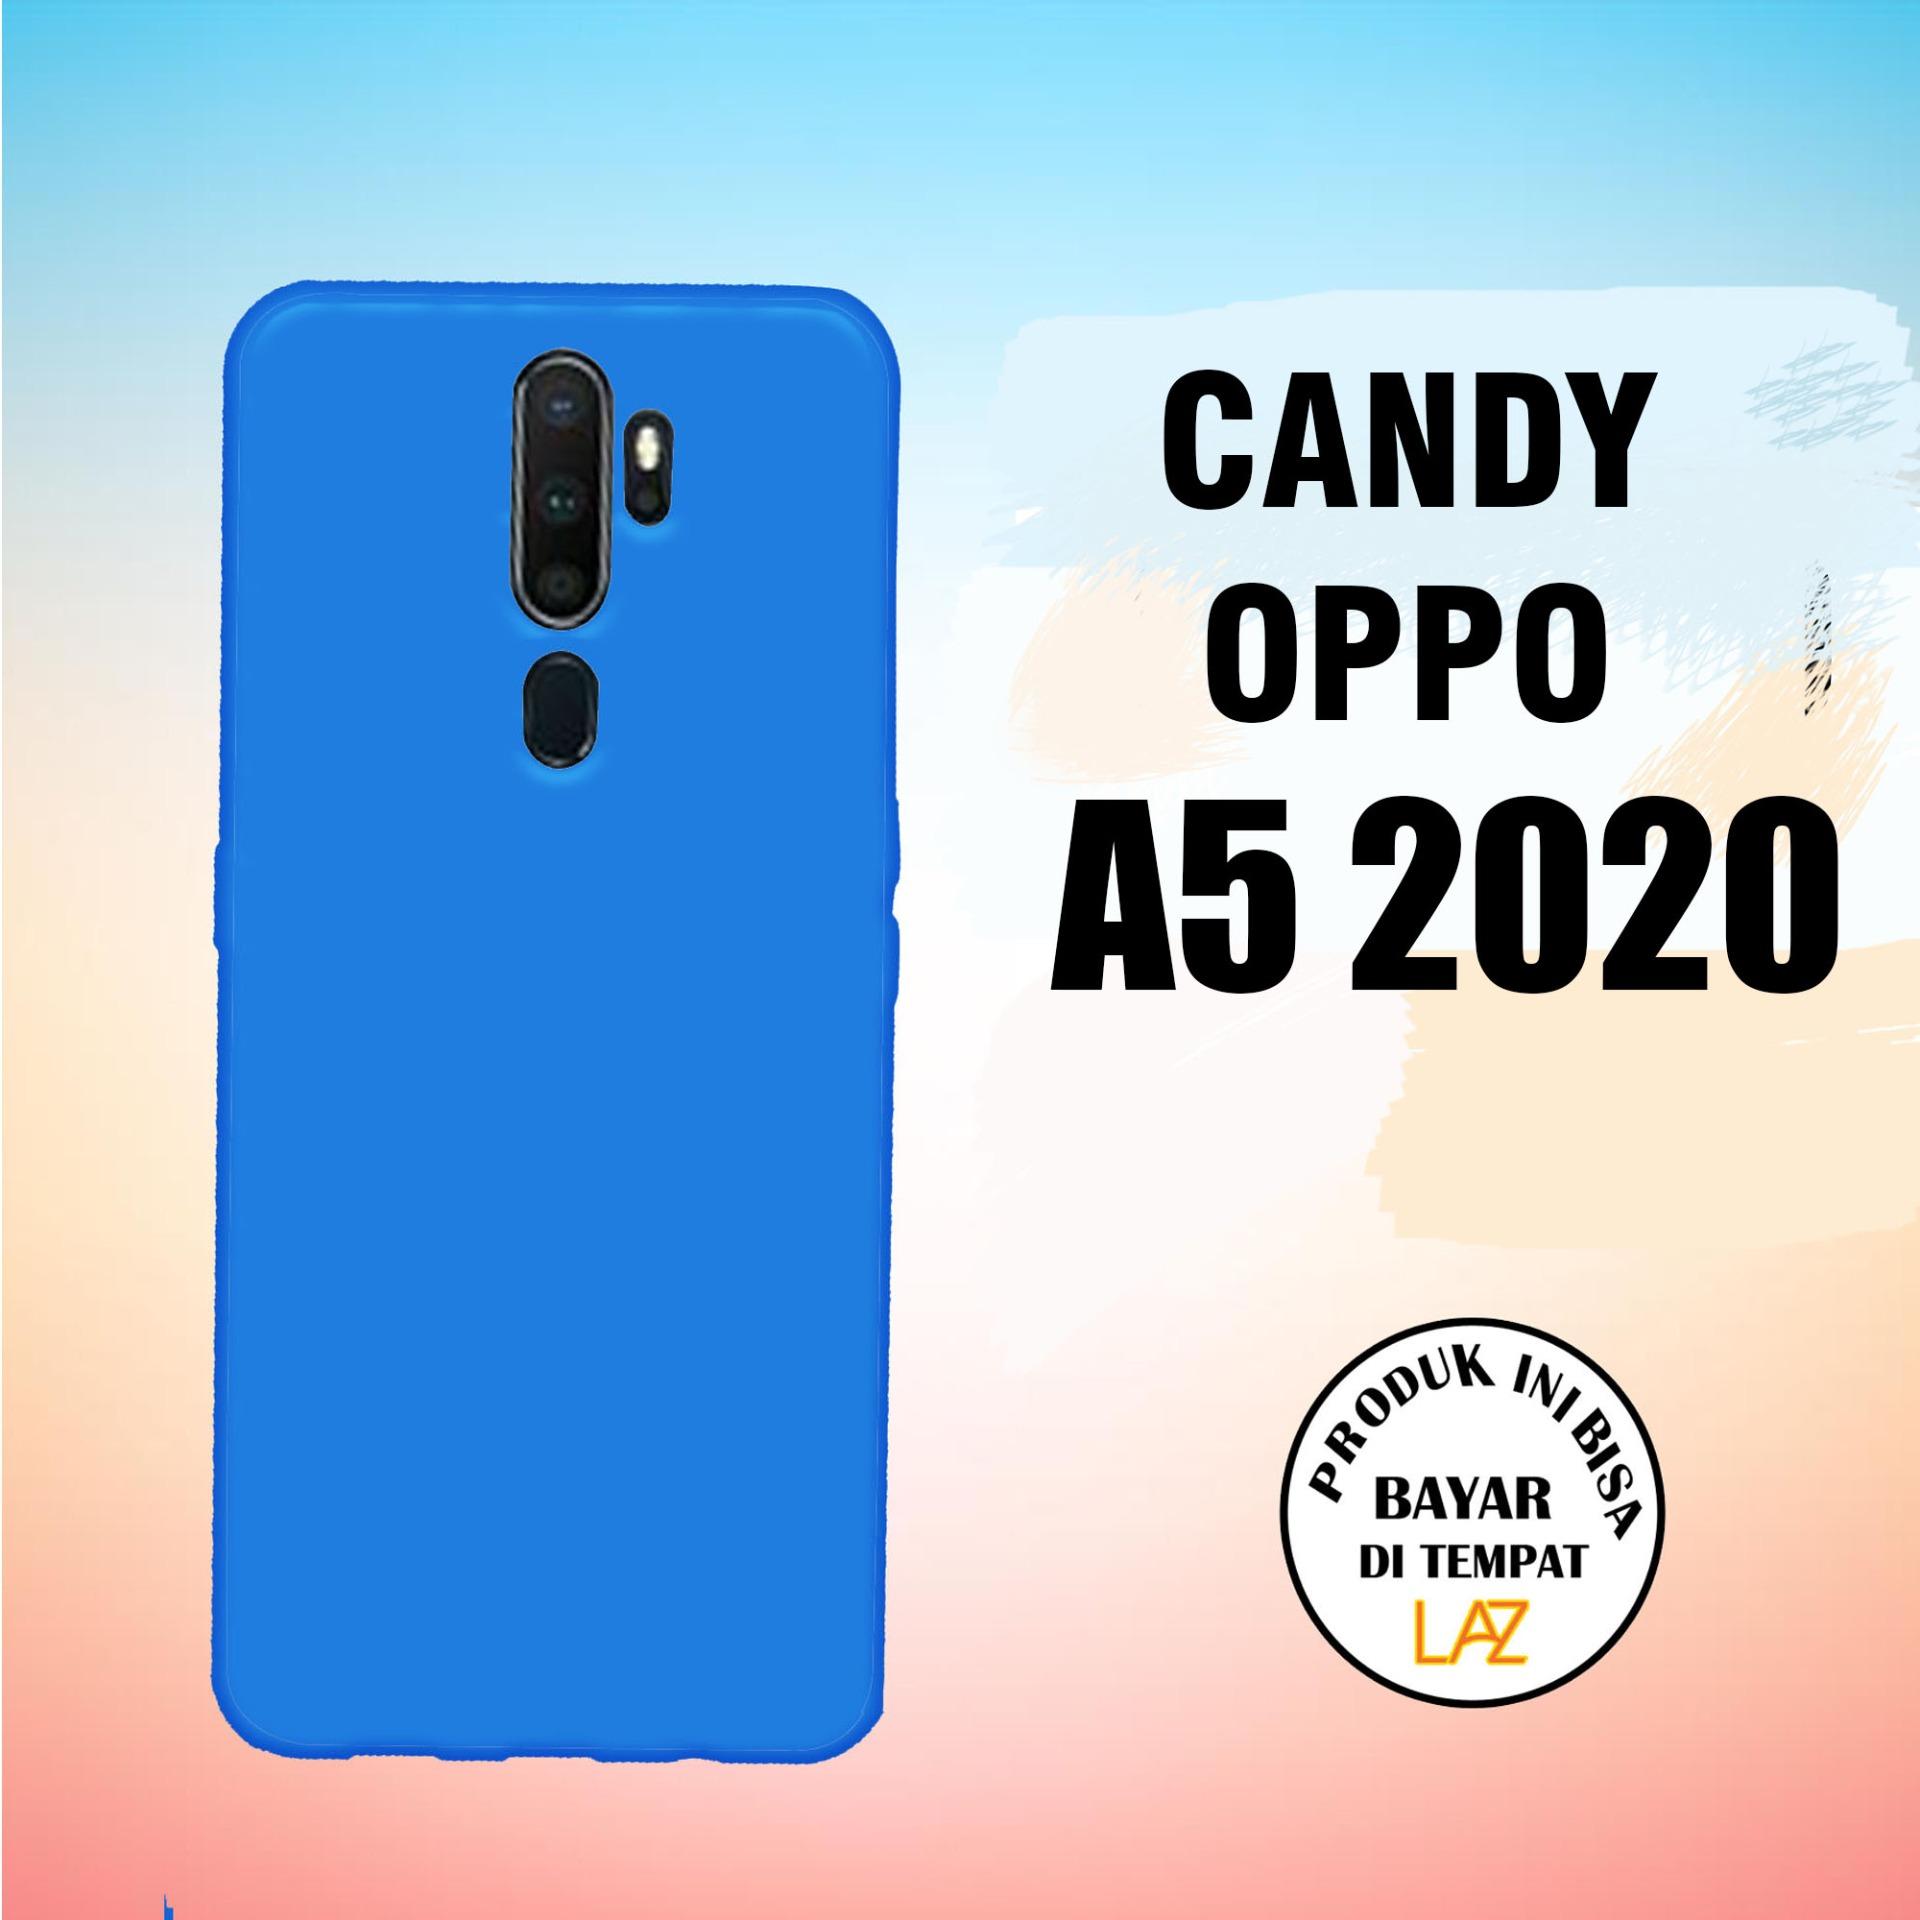 candy case oppo a5 2020 variasi warna bisa bayar ditempat (cod)